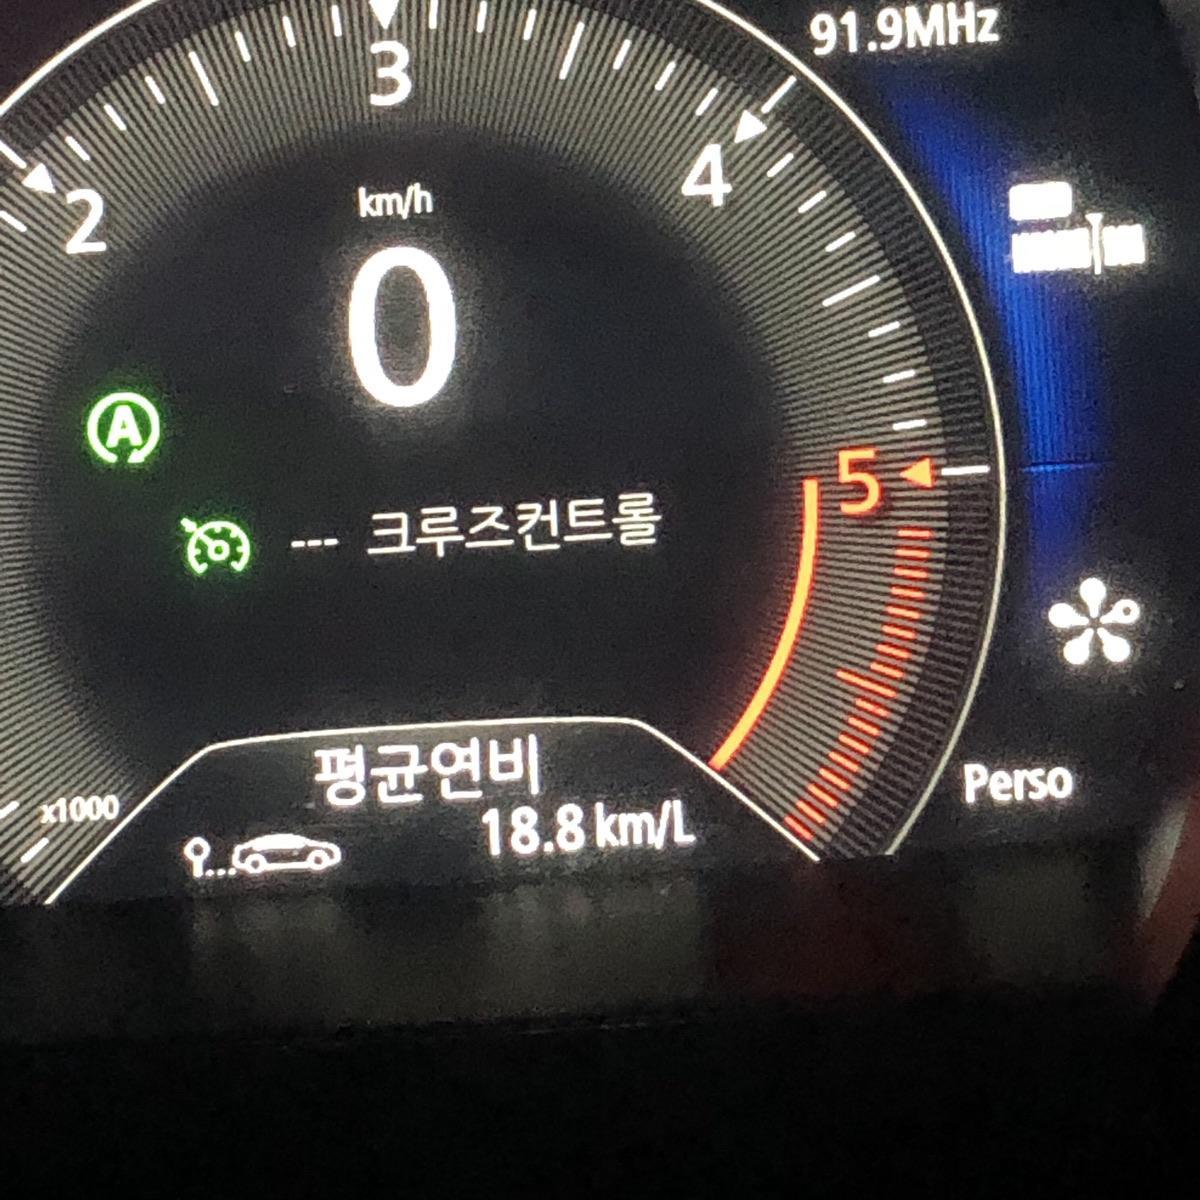 sm6 (탈리스만) dci 디젤  팝니다 (개인거래) - 3